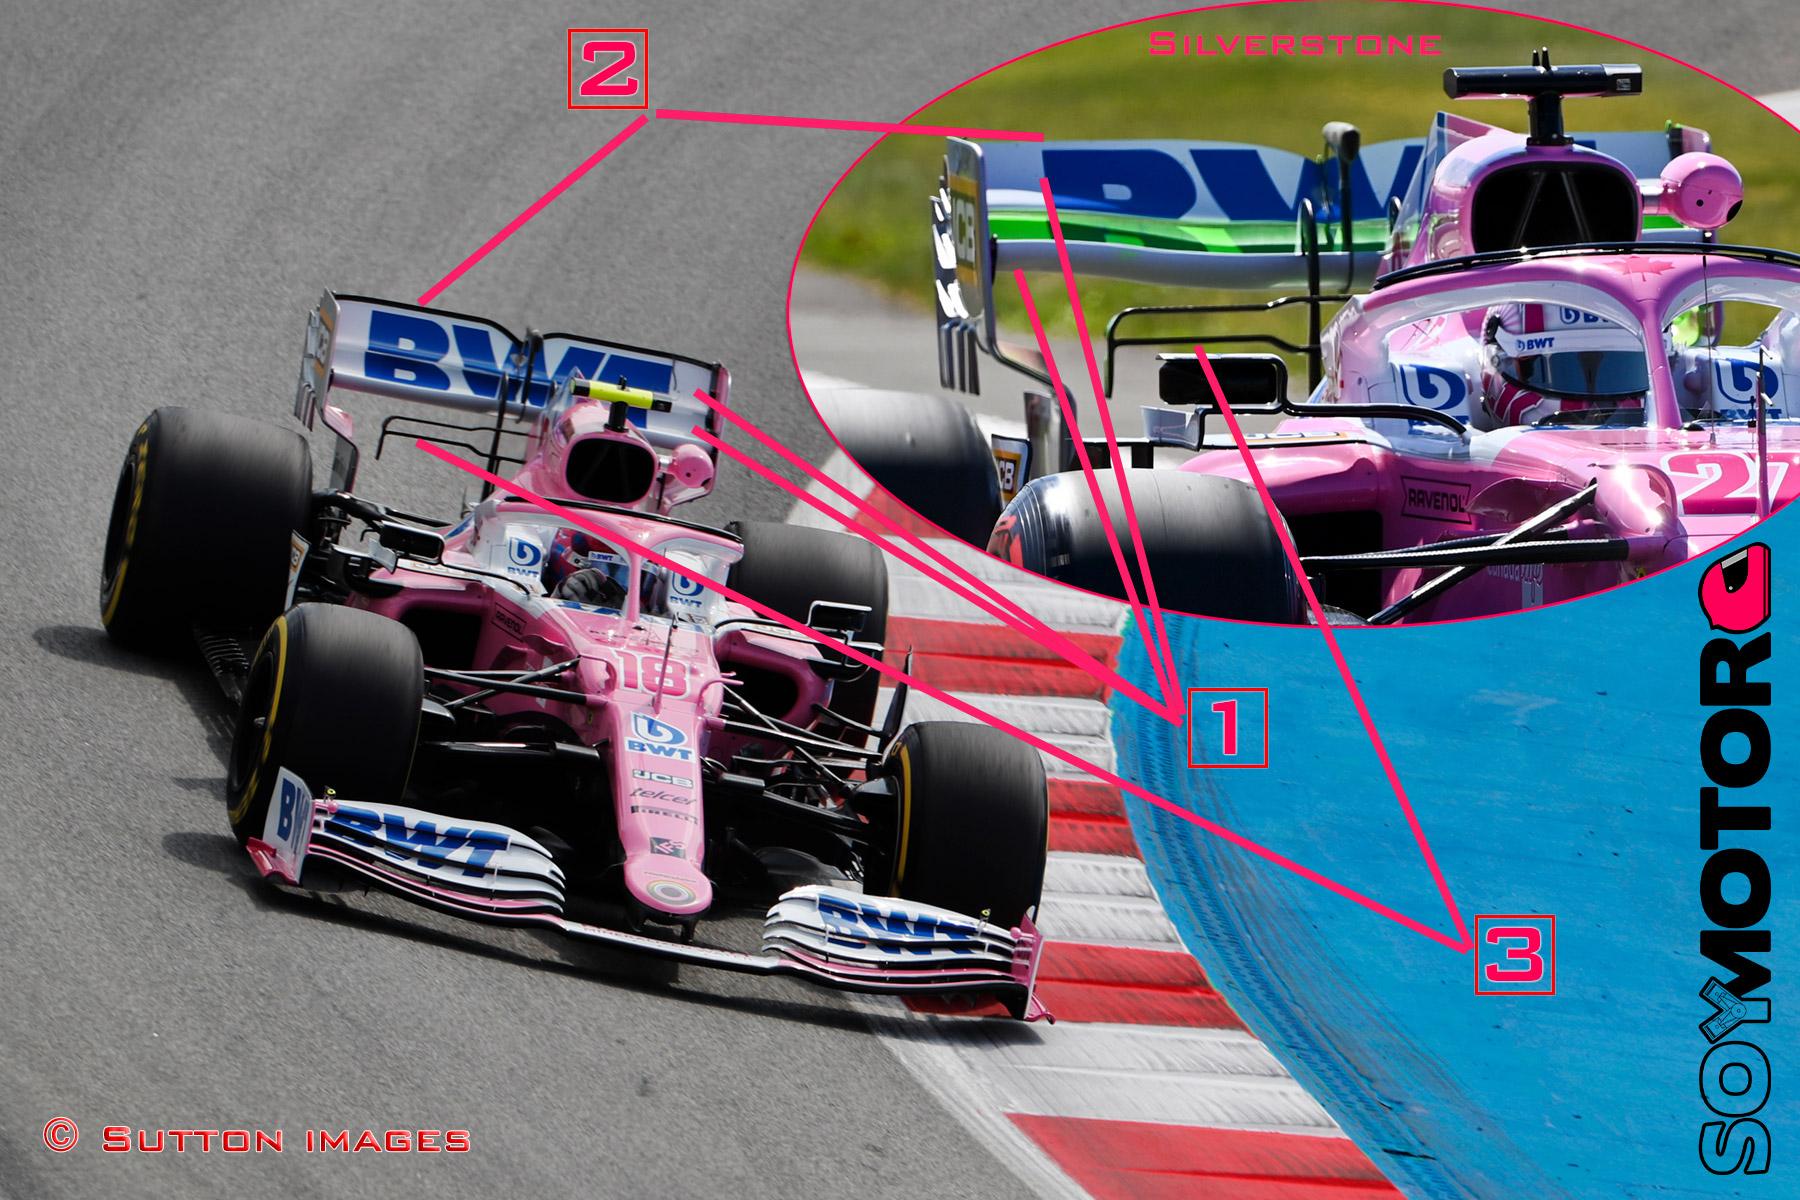 racing-point-configuracion-trasera-soymotor_0.jpg